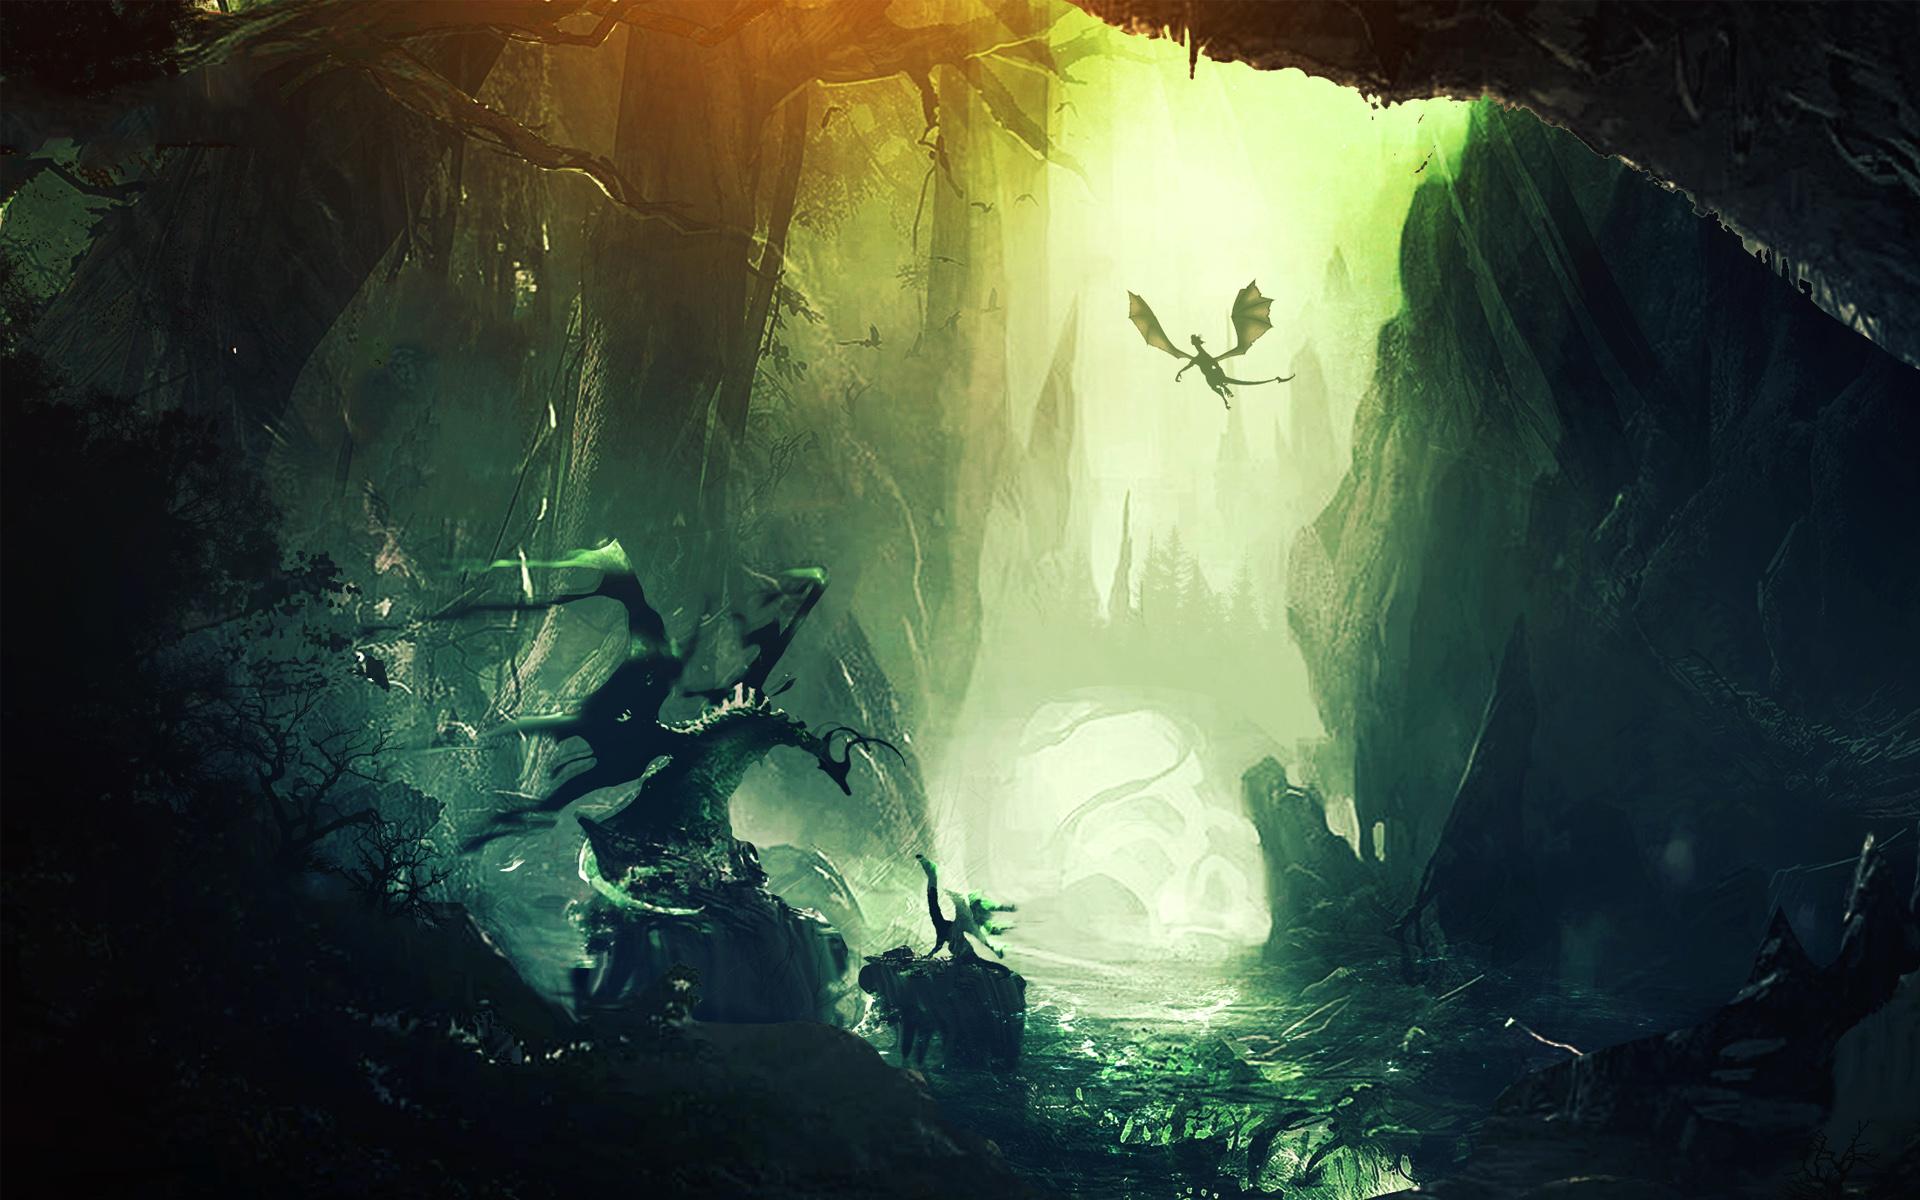 3d Live Waterfall Wallpaper For Desktop Dragon Wings Wallpapers Hd Wallpapers Id 13248